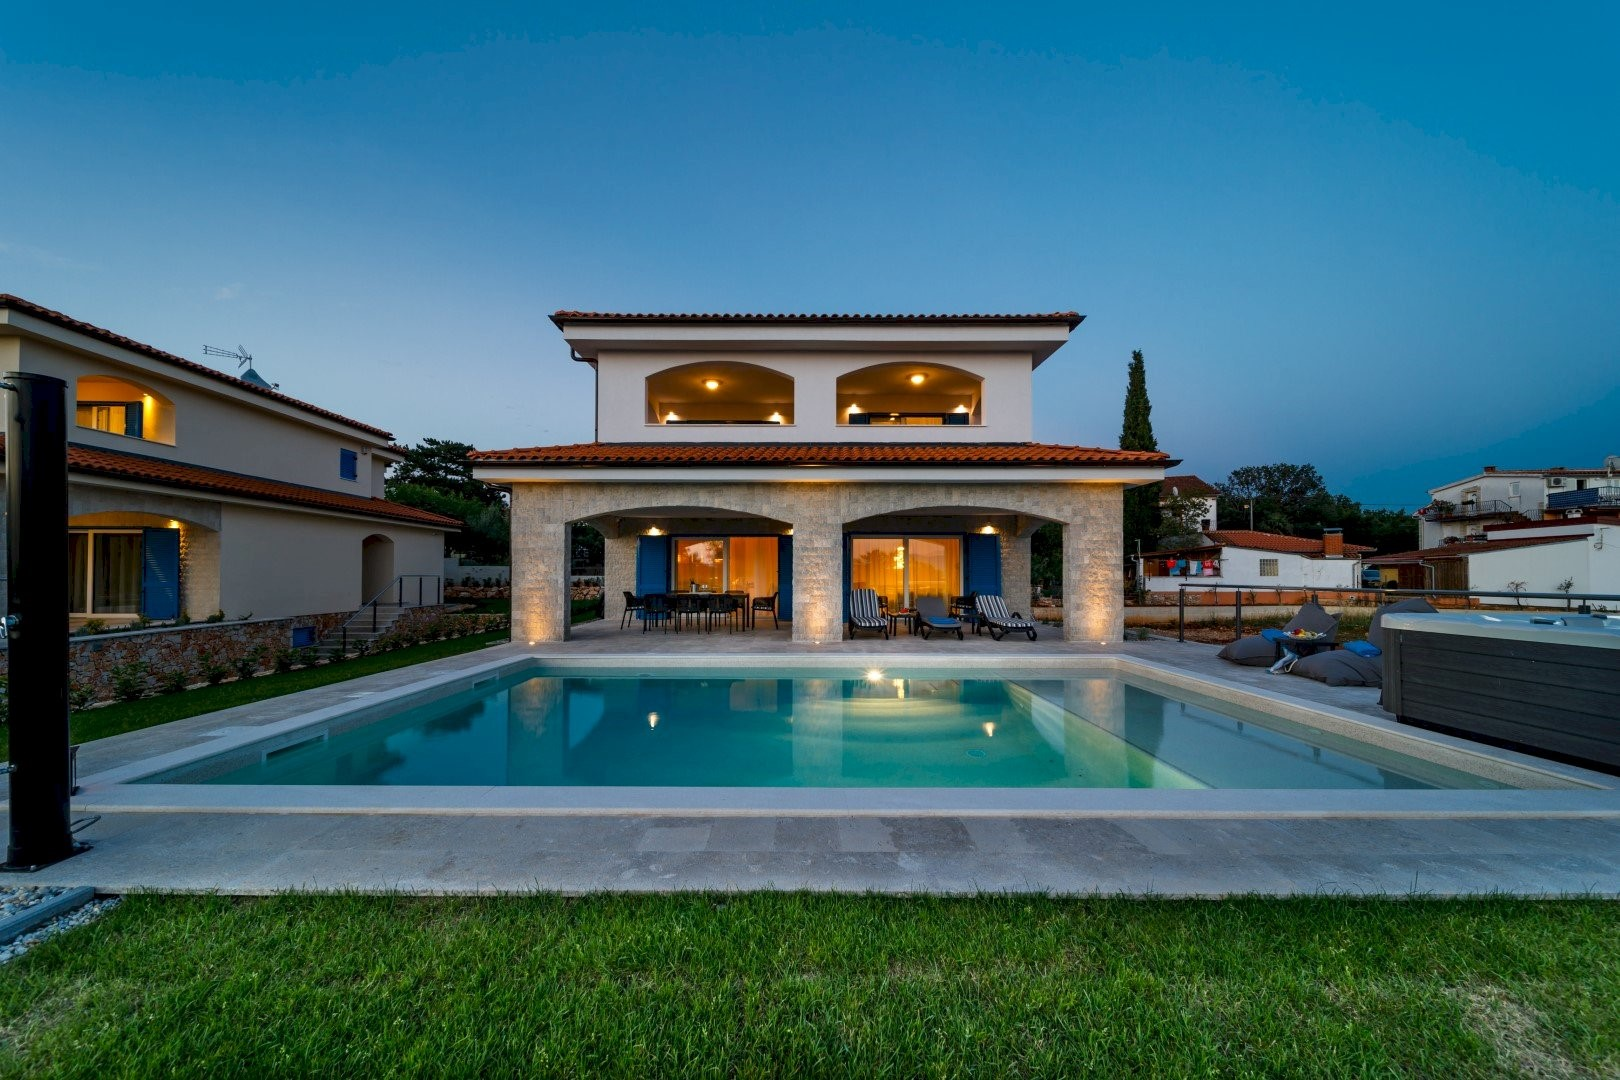 Ferienhaus Luxury Villa Loma 2 (2586643), Sveti Vid-Miholjice, Insel Krk, Kvarner, Kroatien, Bild 4